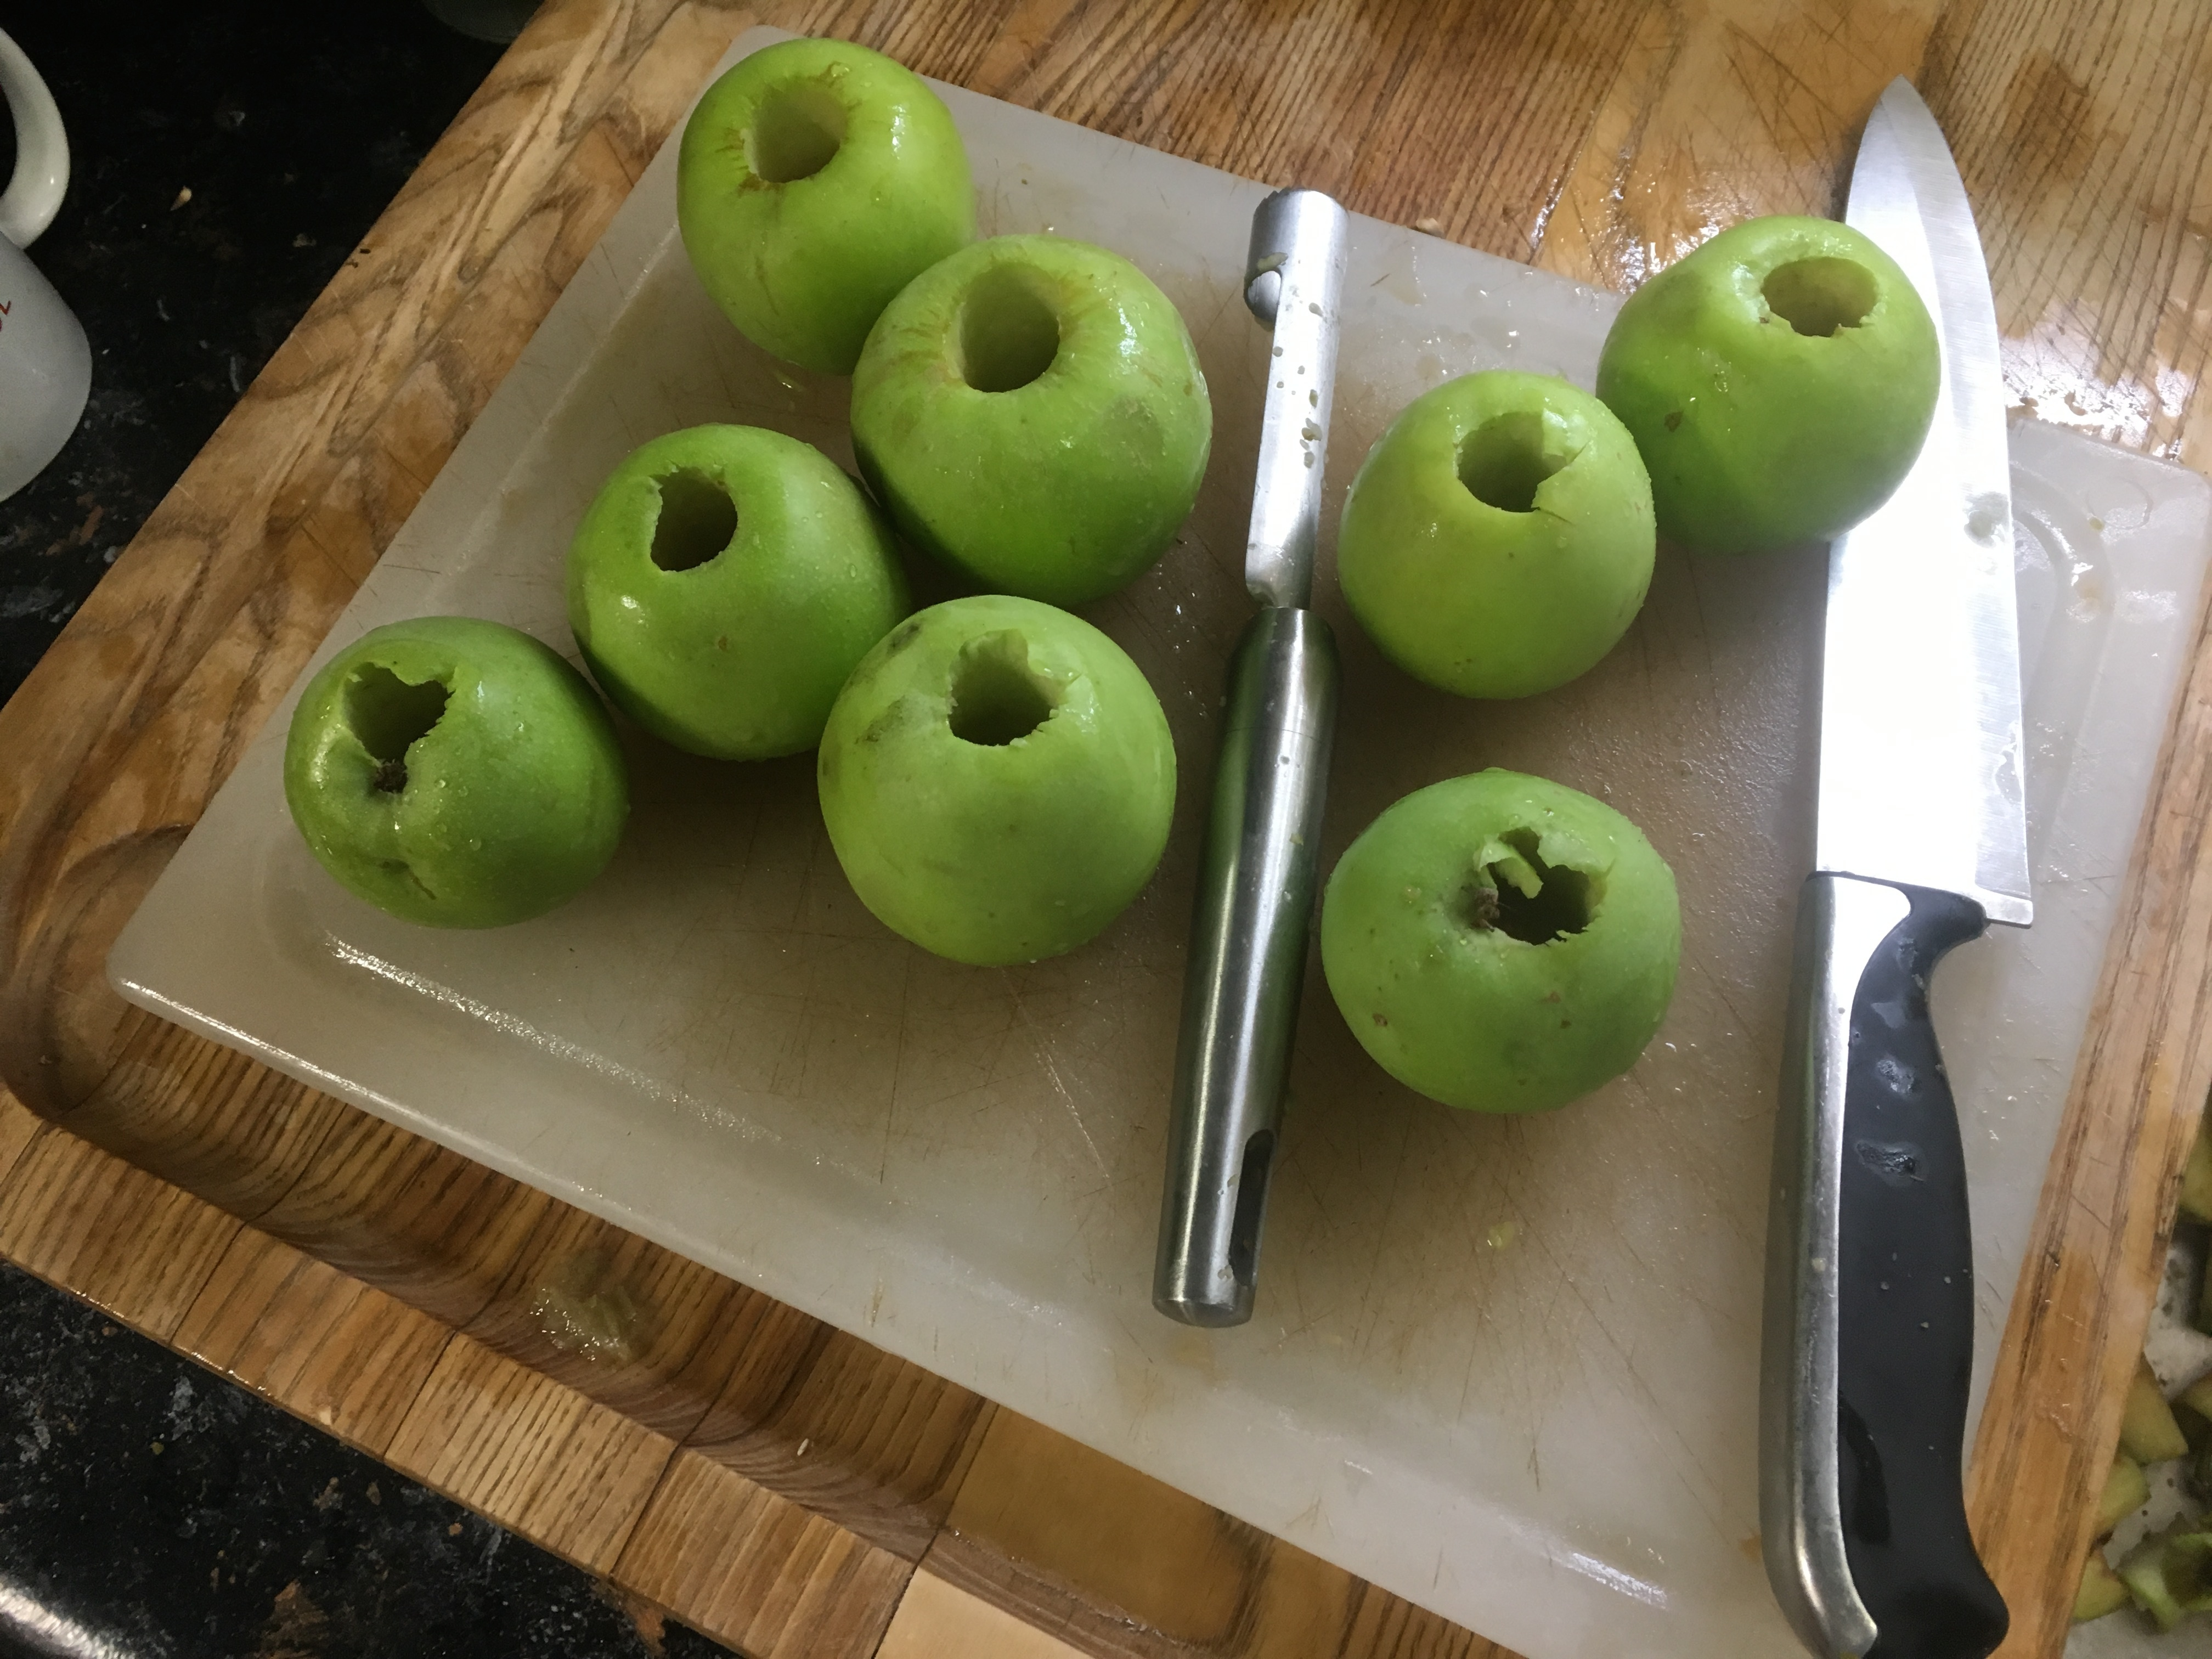 Core and Slice, Apple, Food, People, HQ Photo